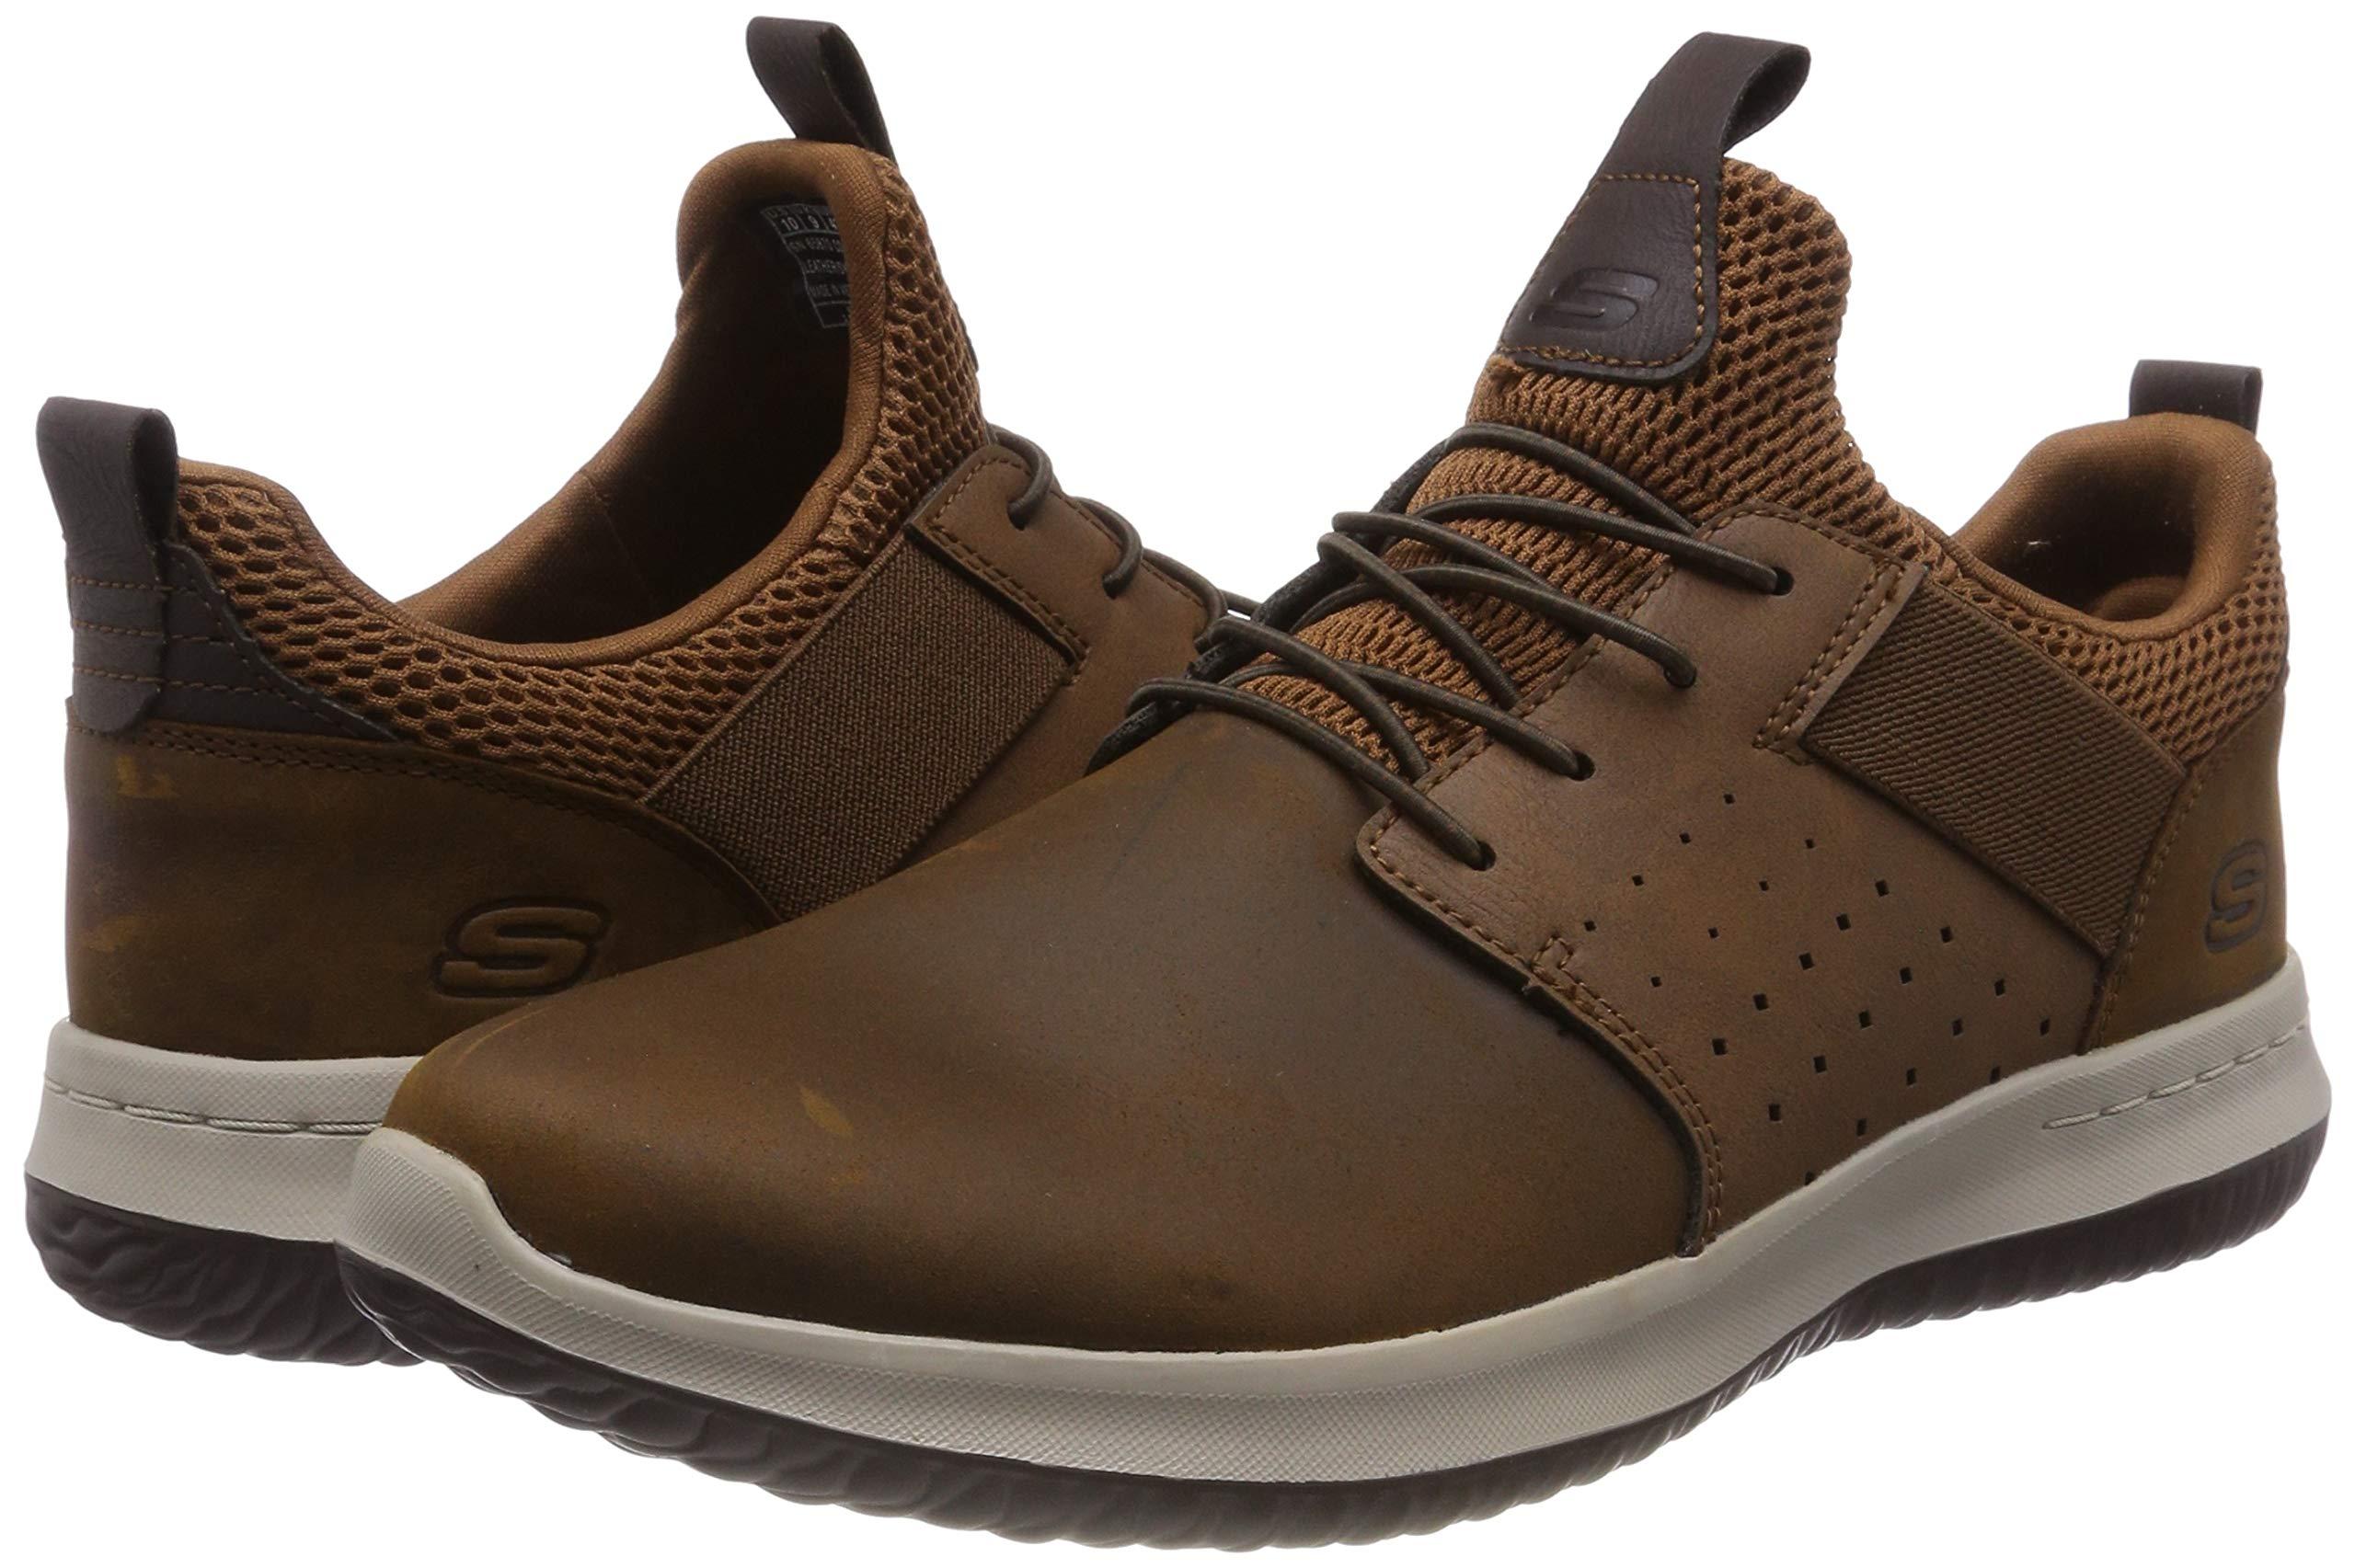 Skechers Men's Delson-Axton Sneaker